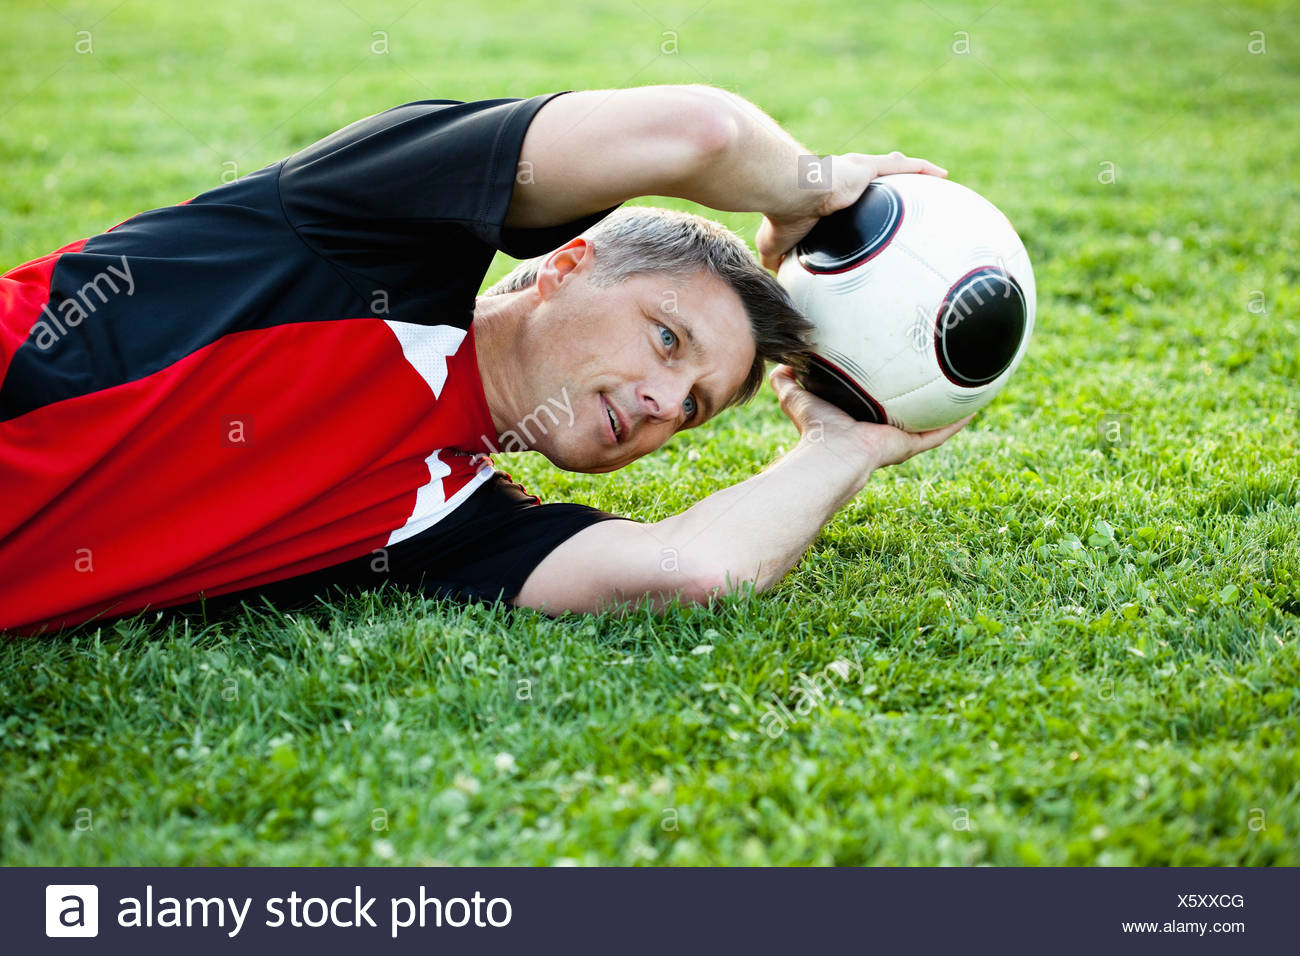 Goalkeeper Saves Ball - Stock Image